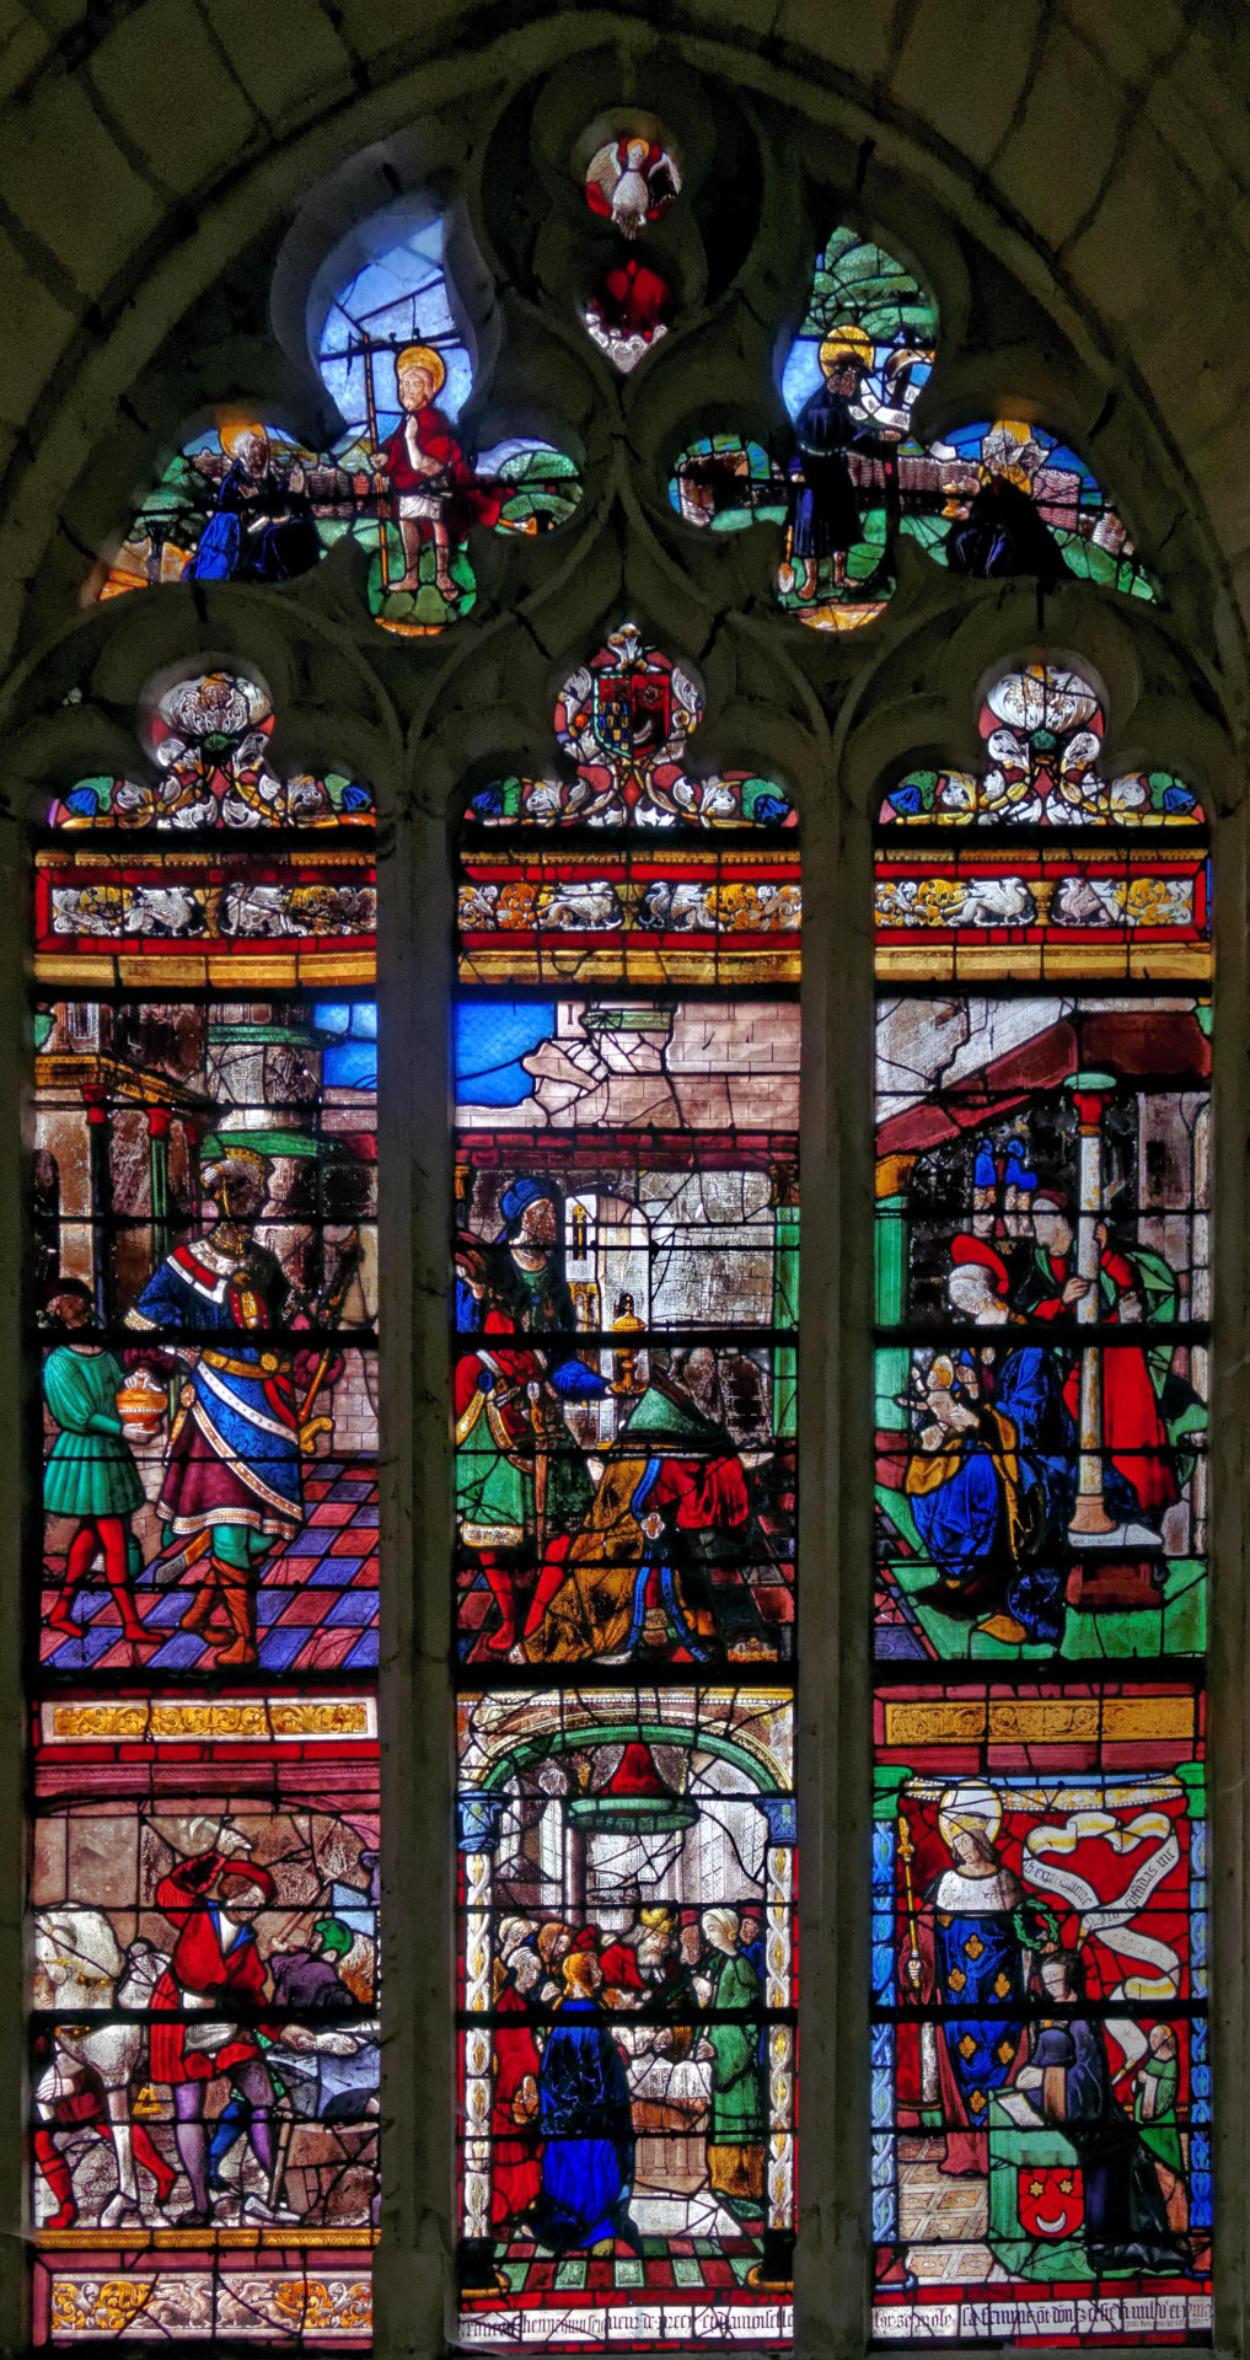 Vitrail vitraux de l 39 glise saint aventin creney pr s for Creney pres troyes